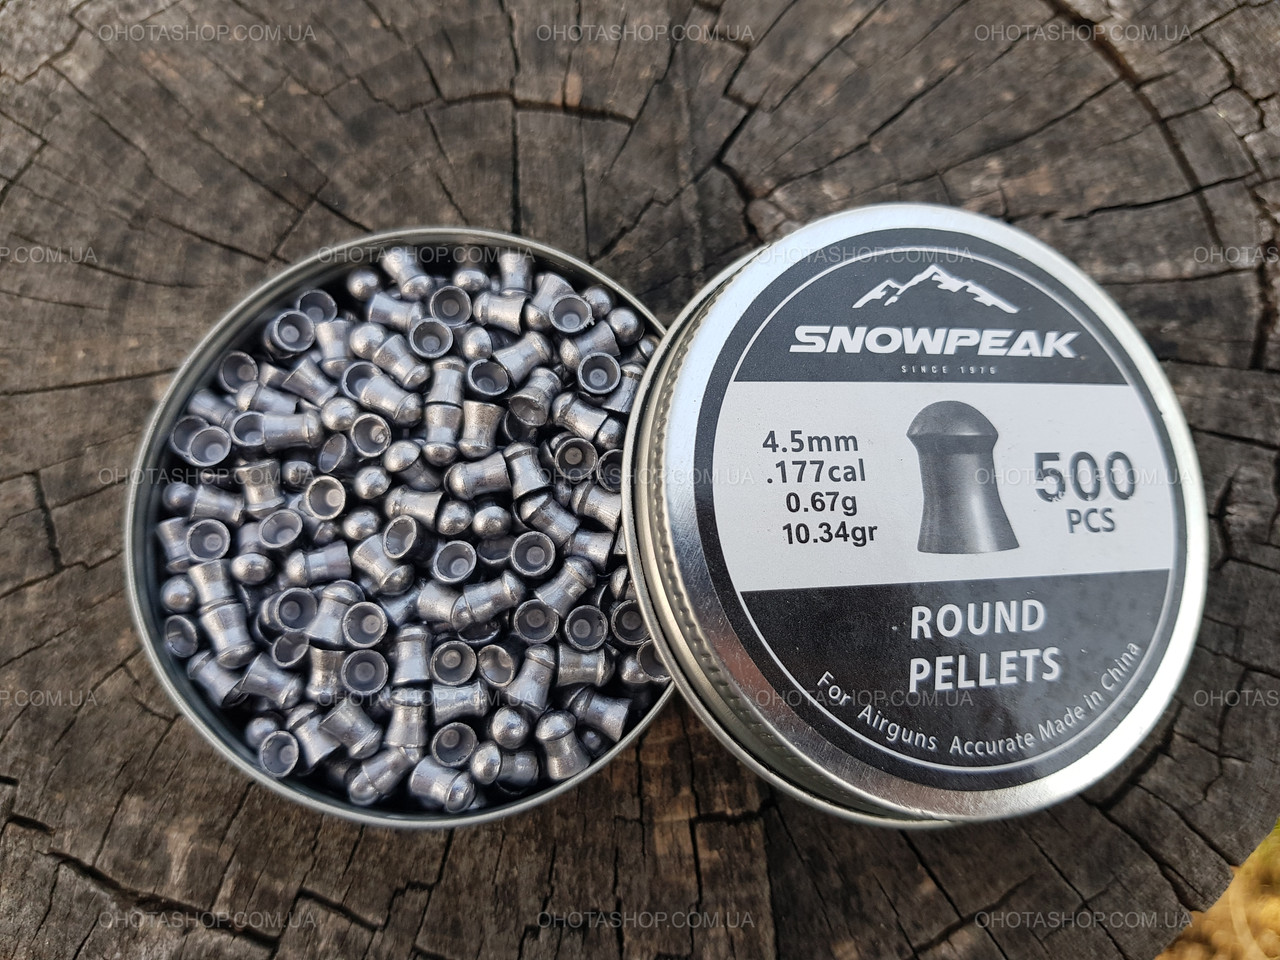 Кулі Snow Peak Round Pellets 0,67 гр. (500 шт.)